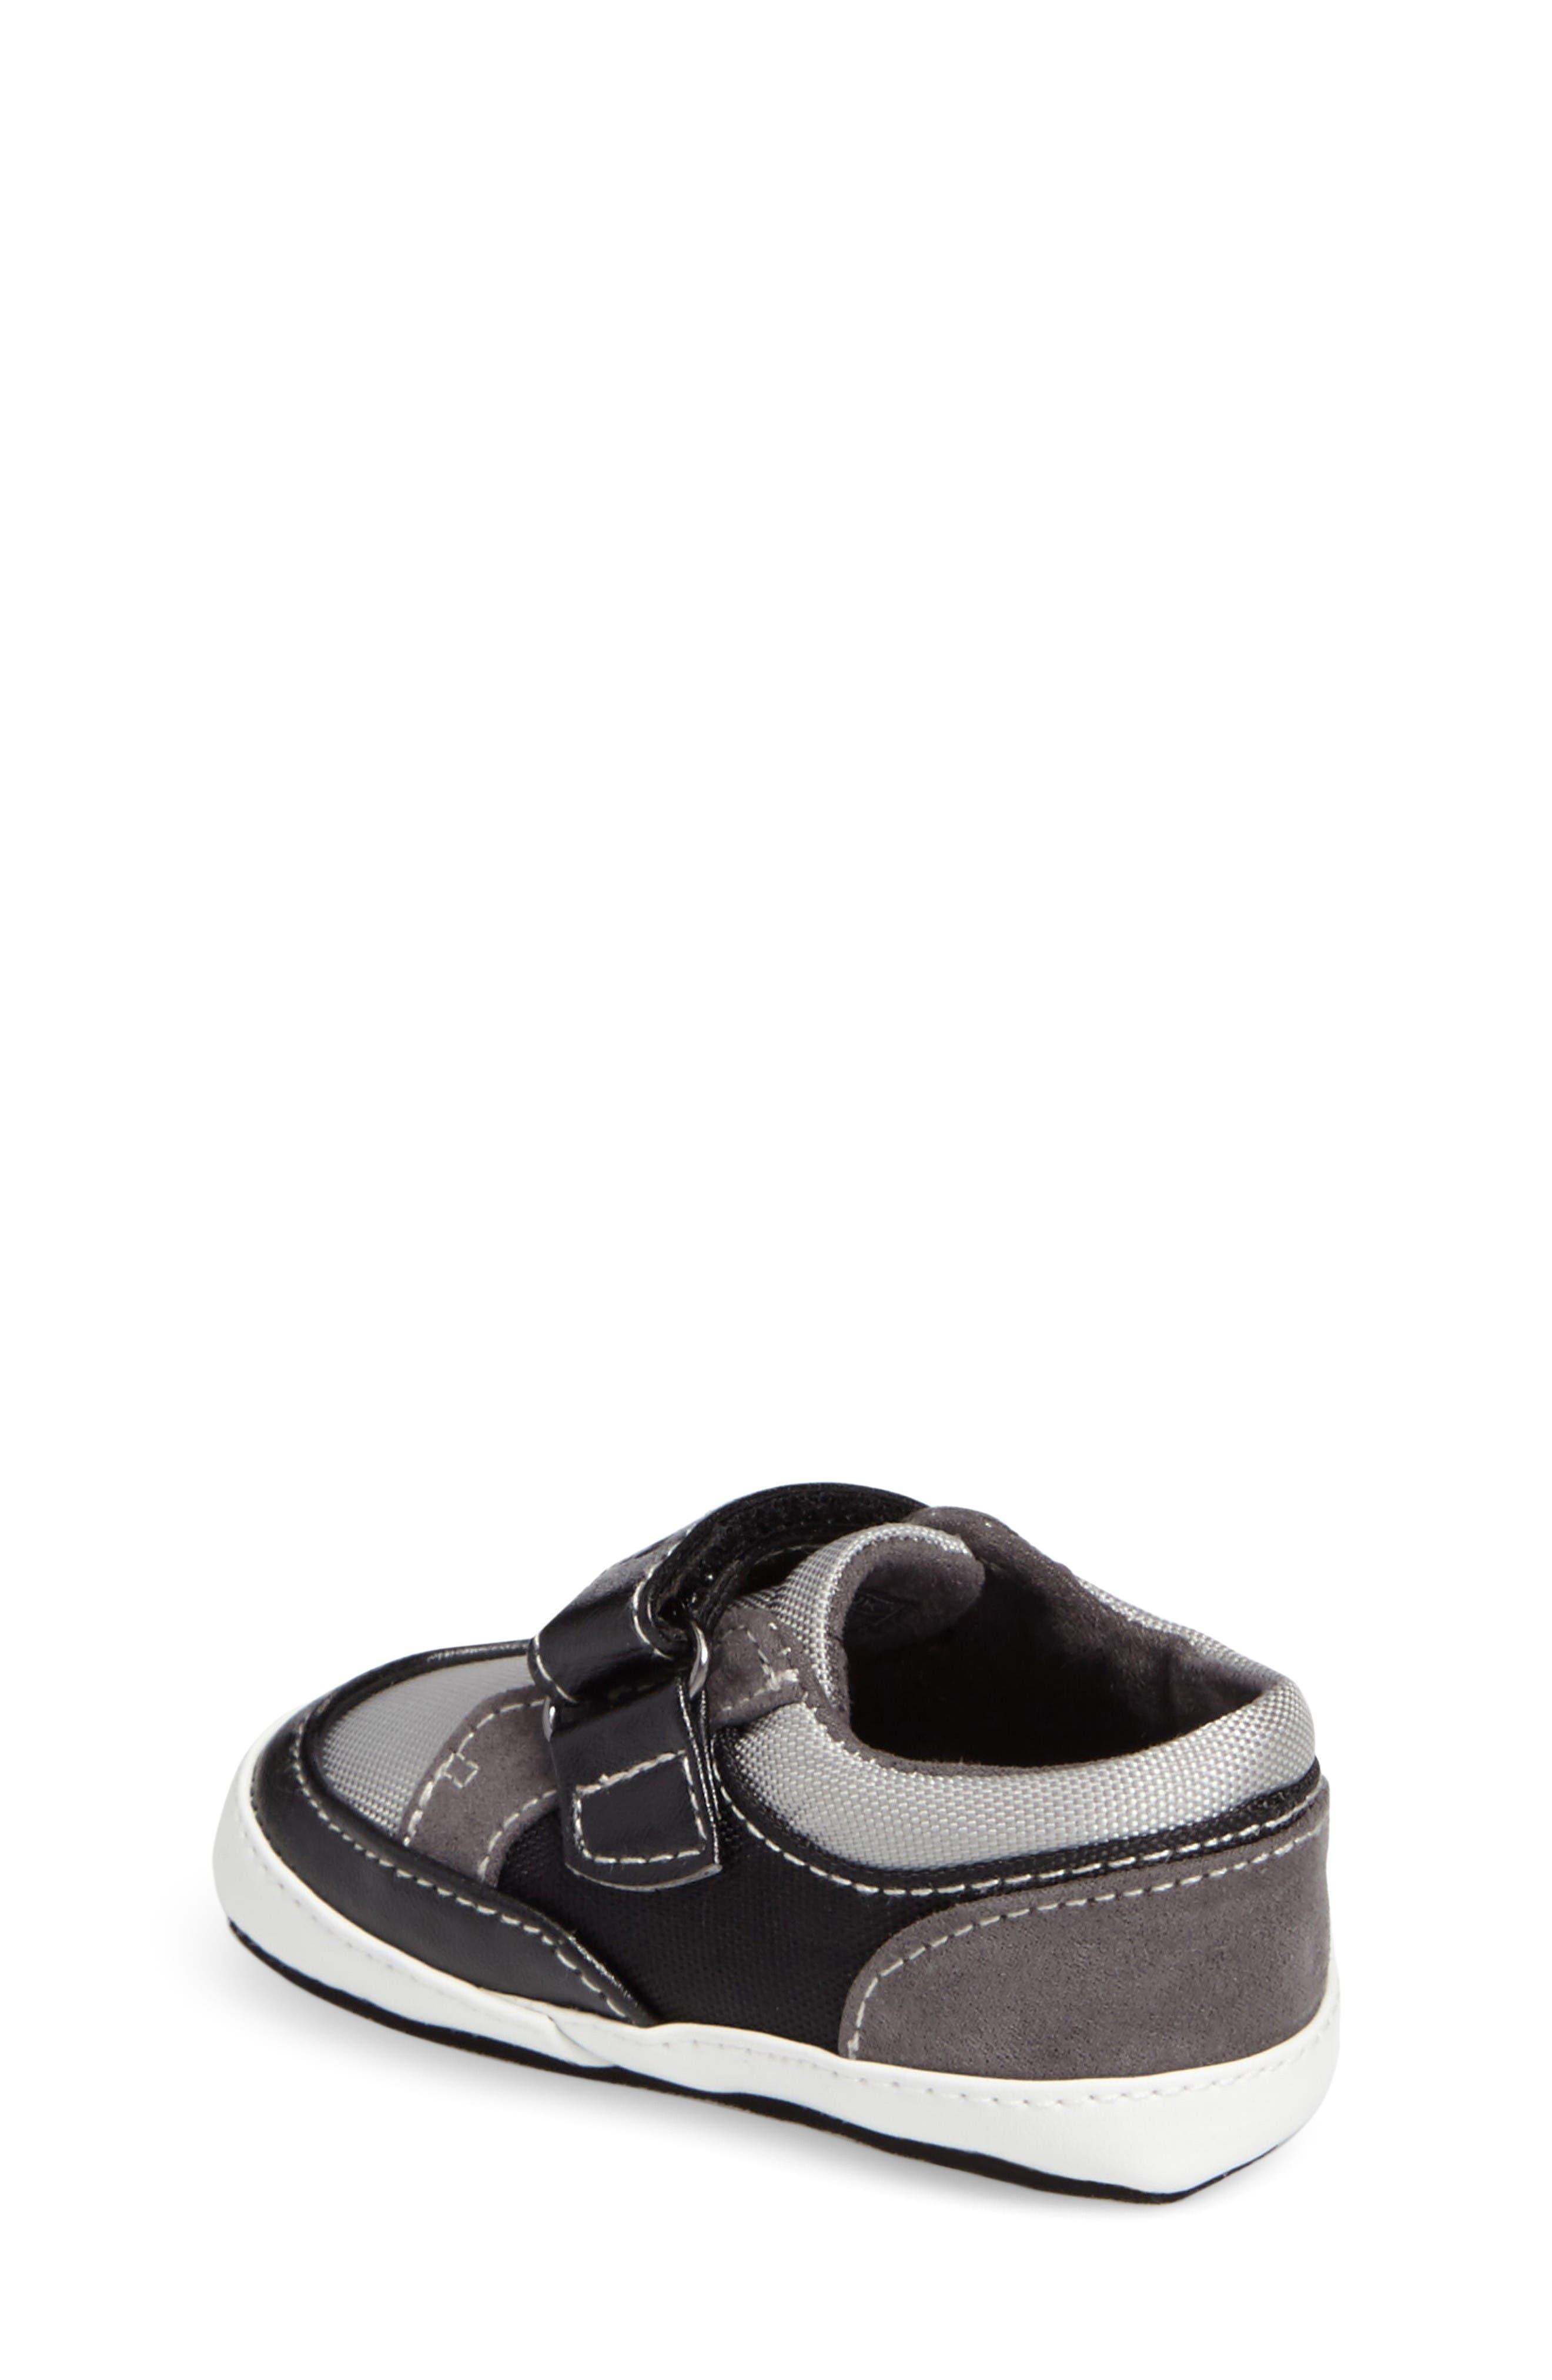 Danny Sneaker,                             Alternate thumbnail 2, color,                             Black/ Grey